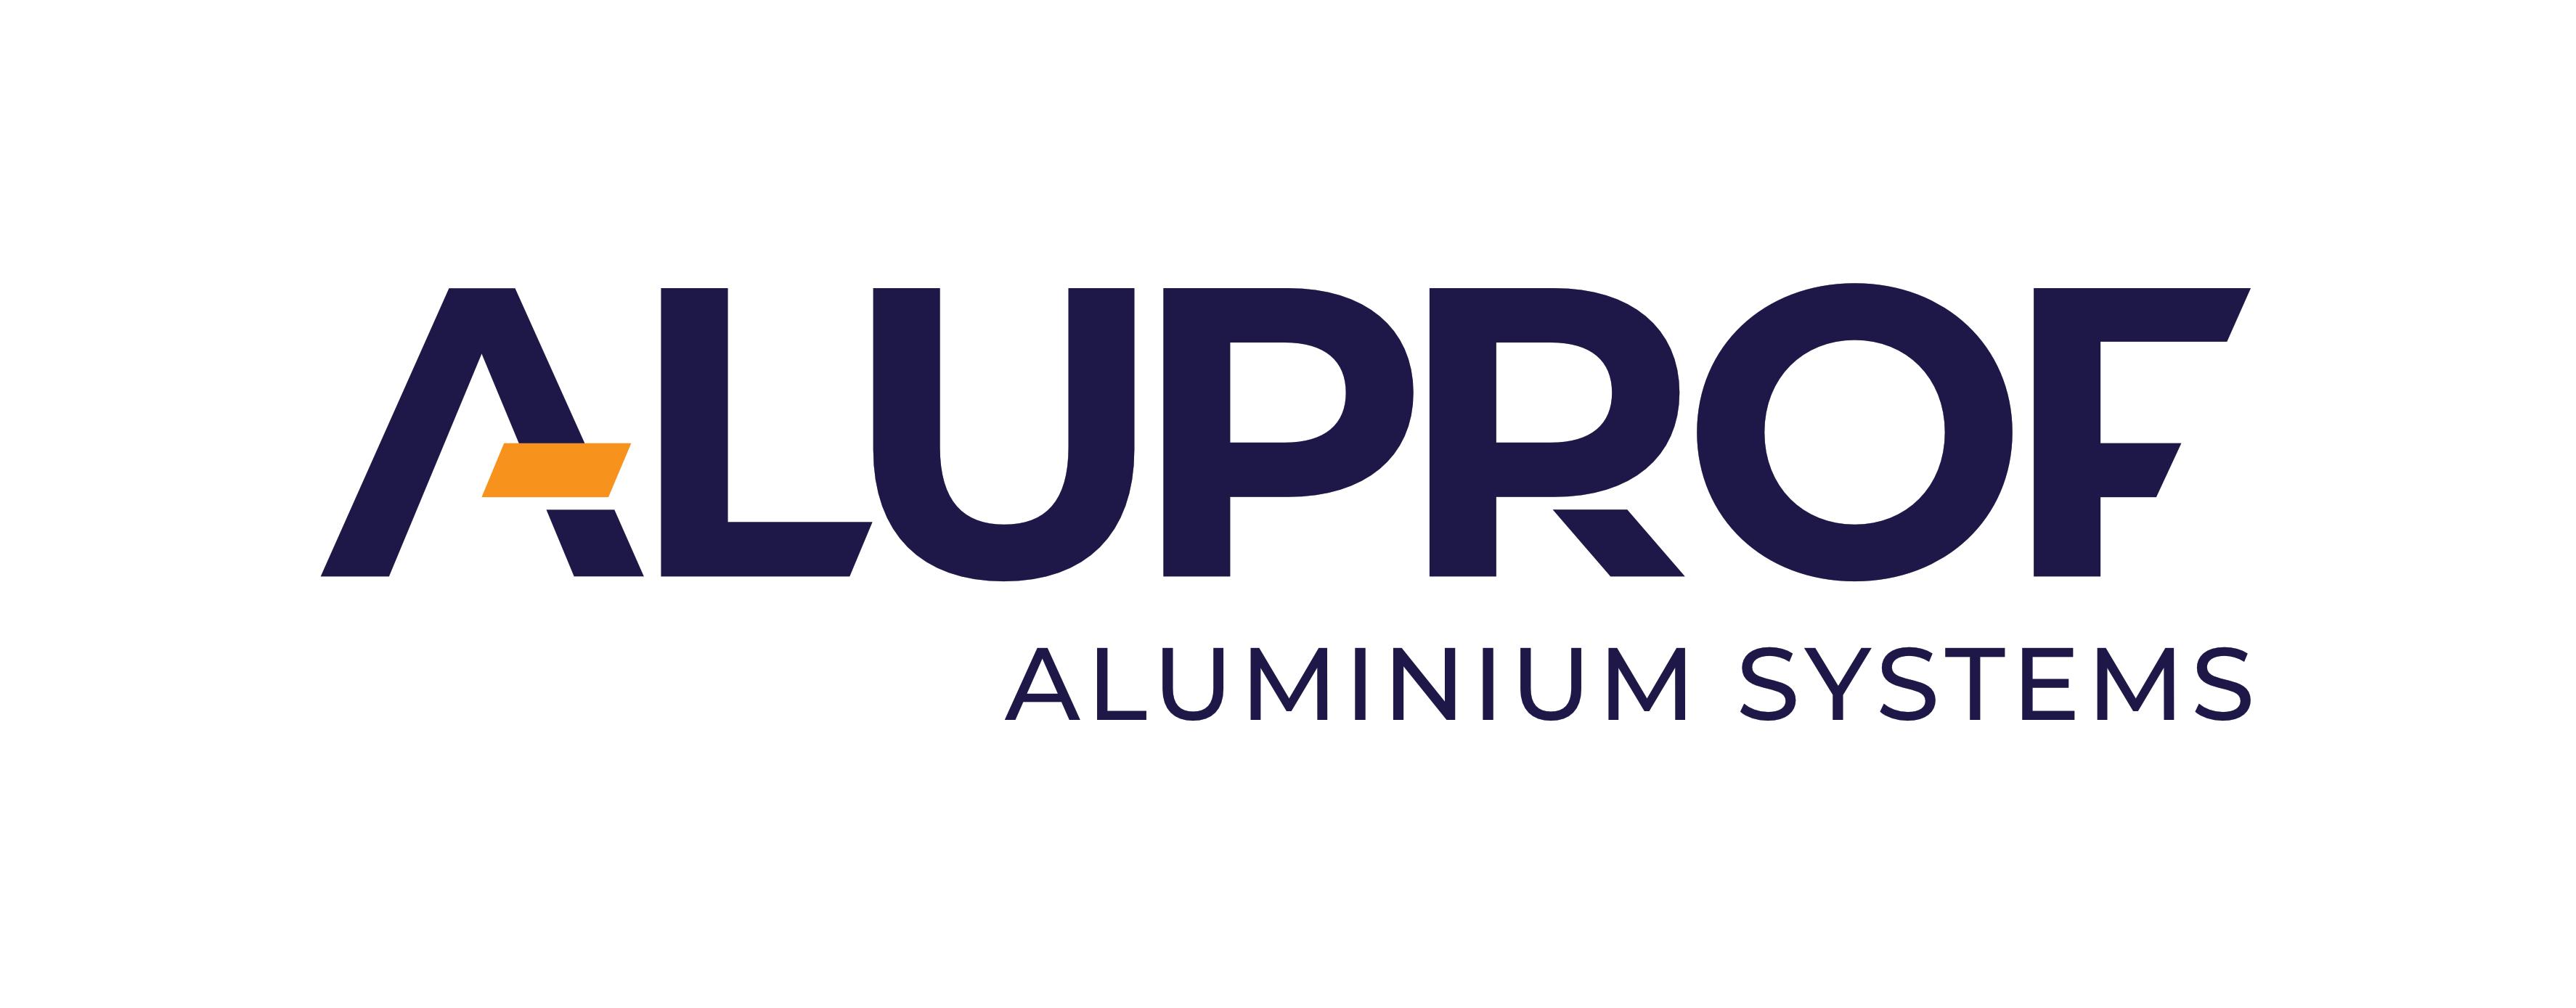 aluprof_logo_2021